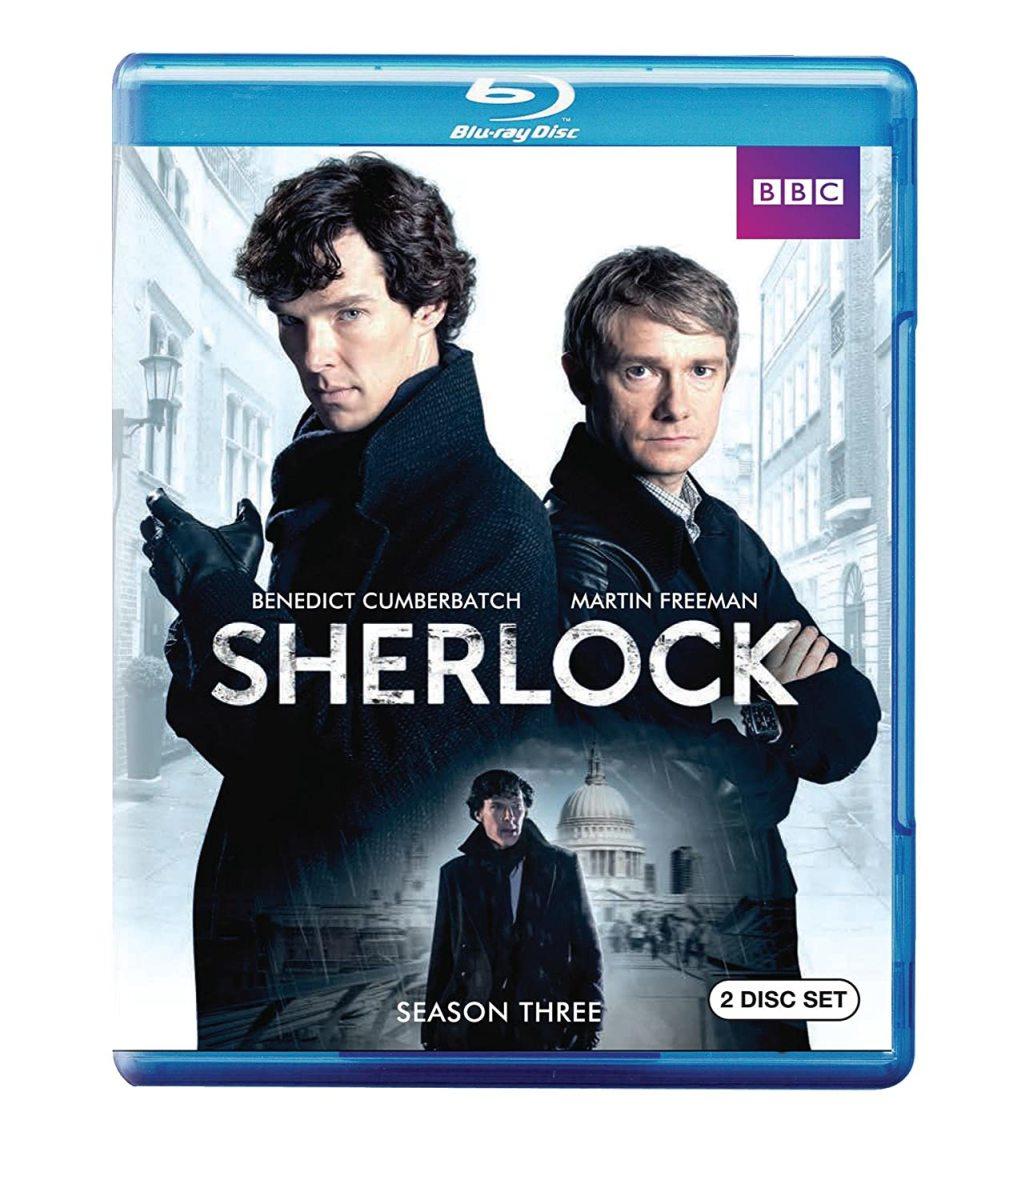 TV Show Review: Sherlock Series 3 (2014)